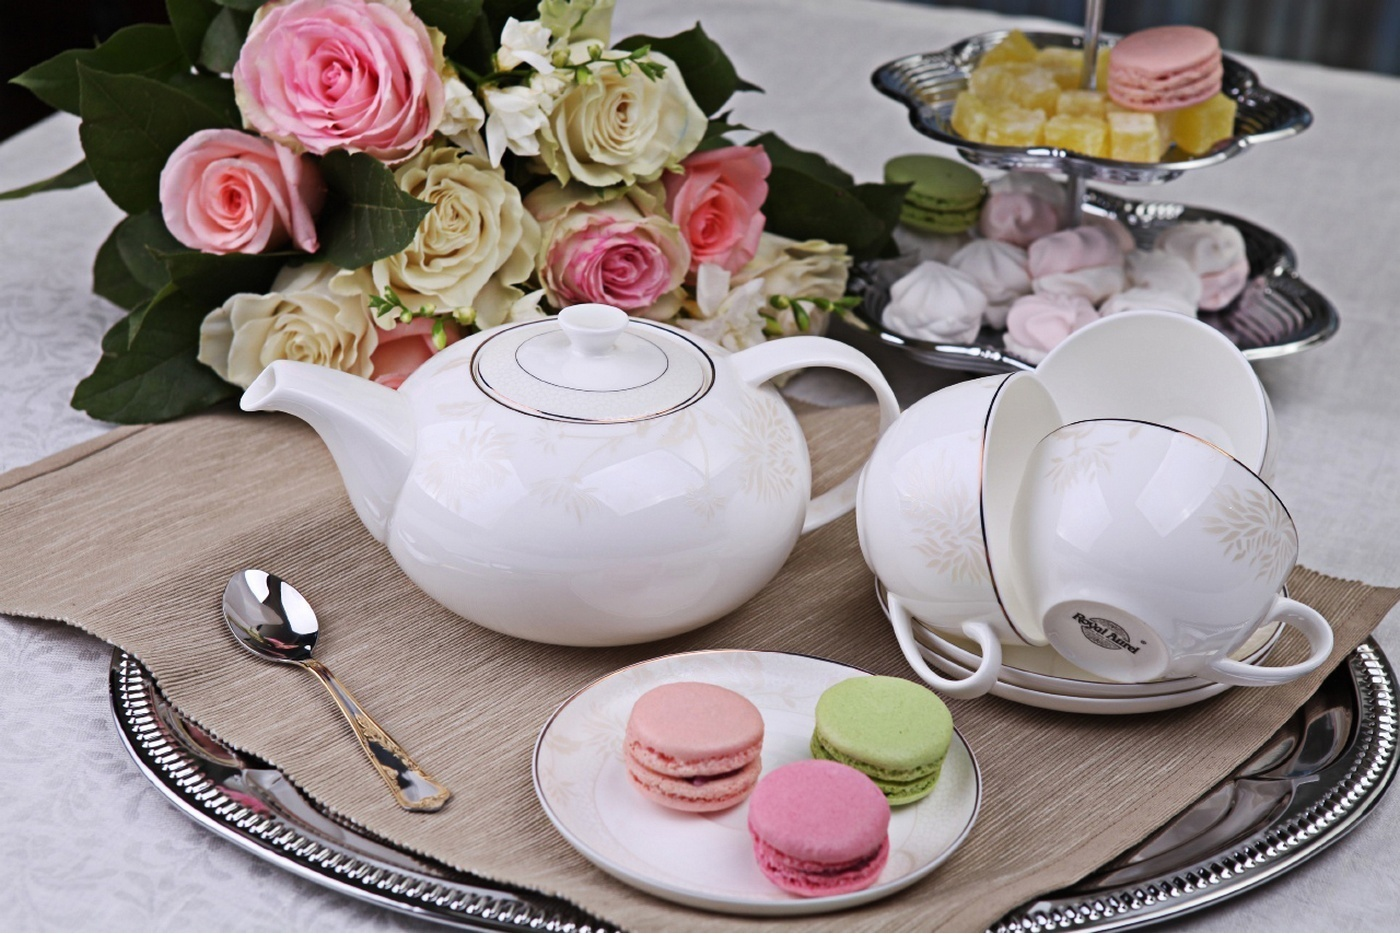 Фото чайного сервиза на столе